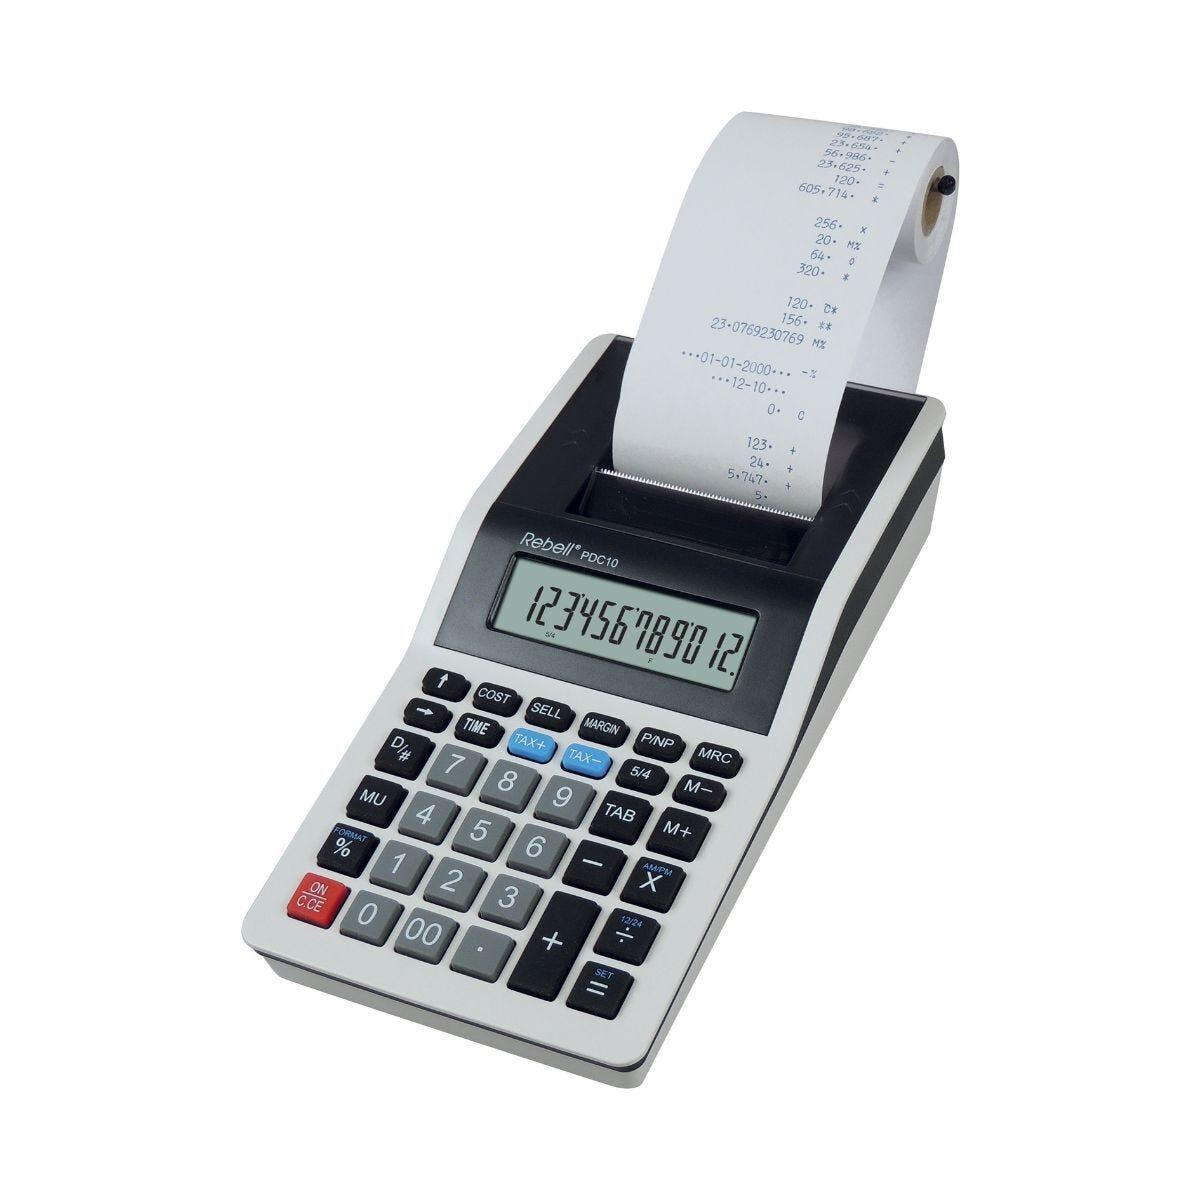 Rebell Printing Calculator PDC10